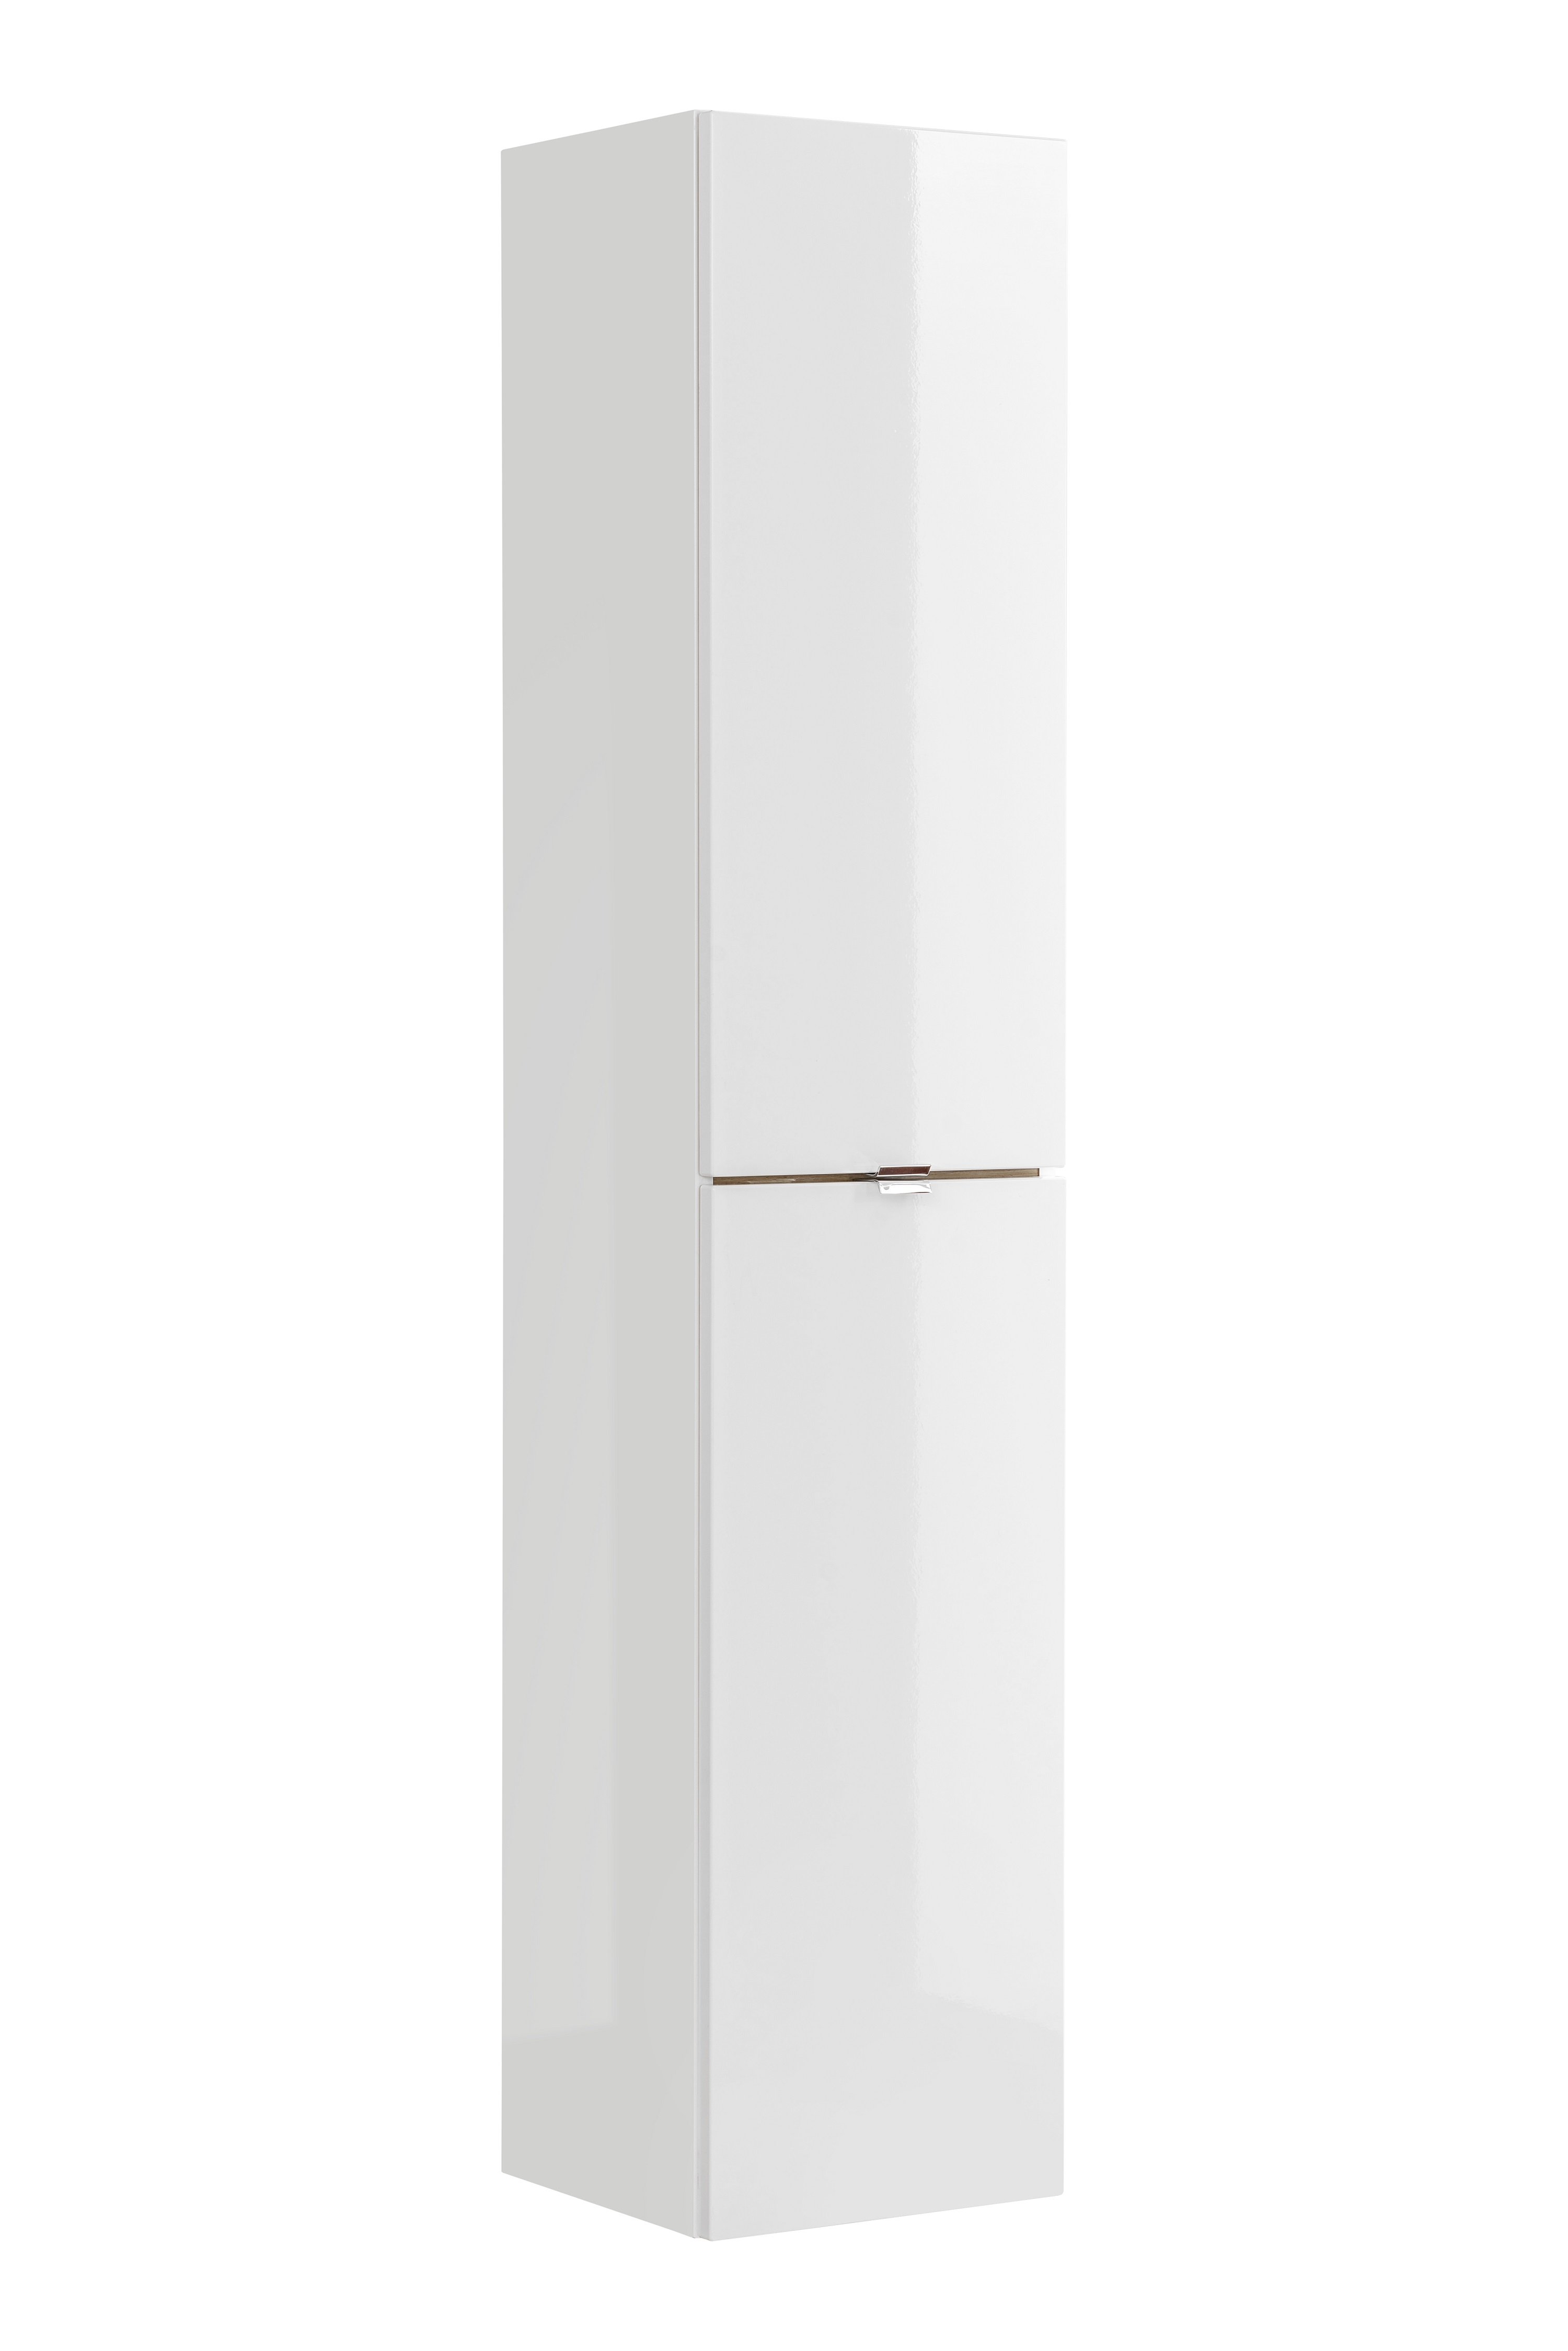 Dulap baie inalt cu 2 usi, Capri White, l35xA33xH170 cm imagine